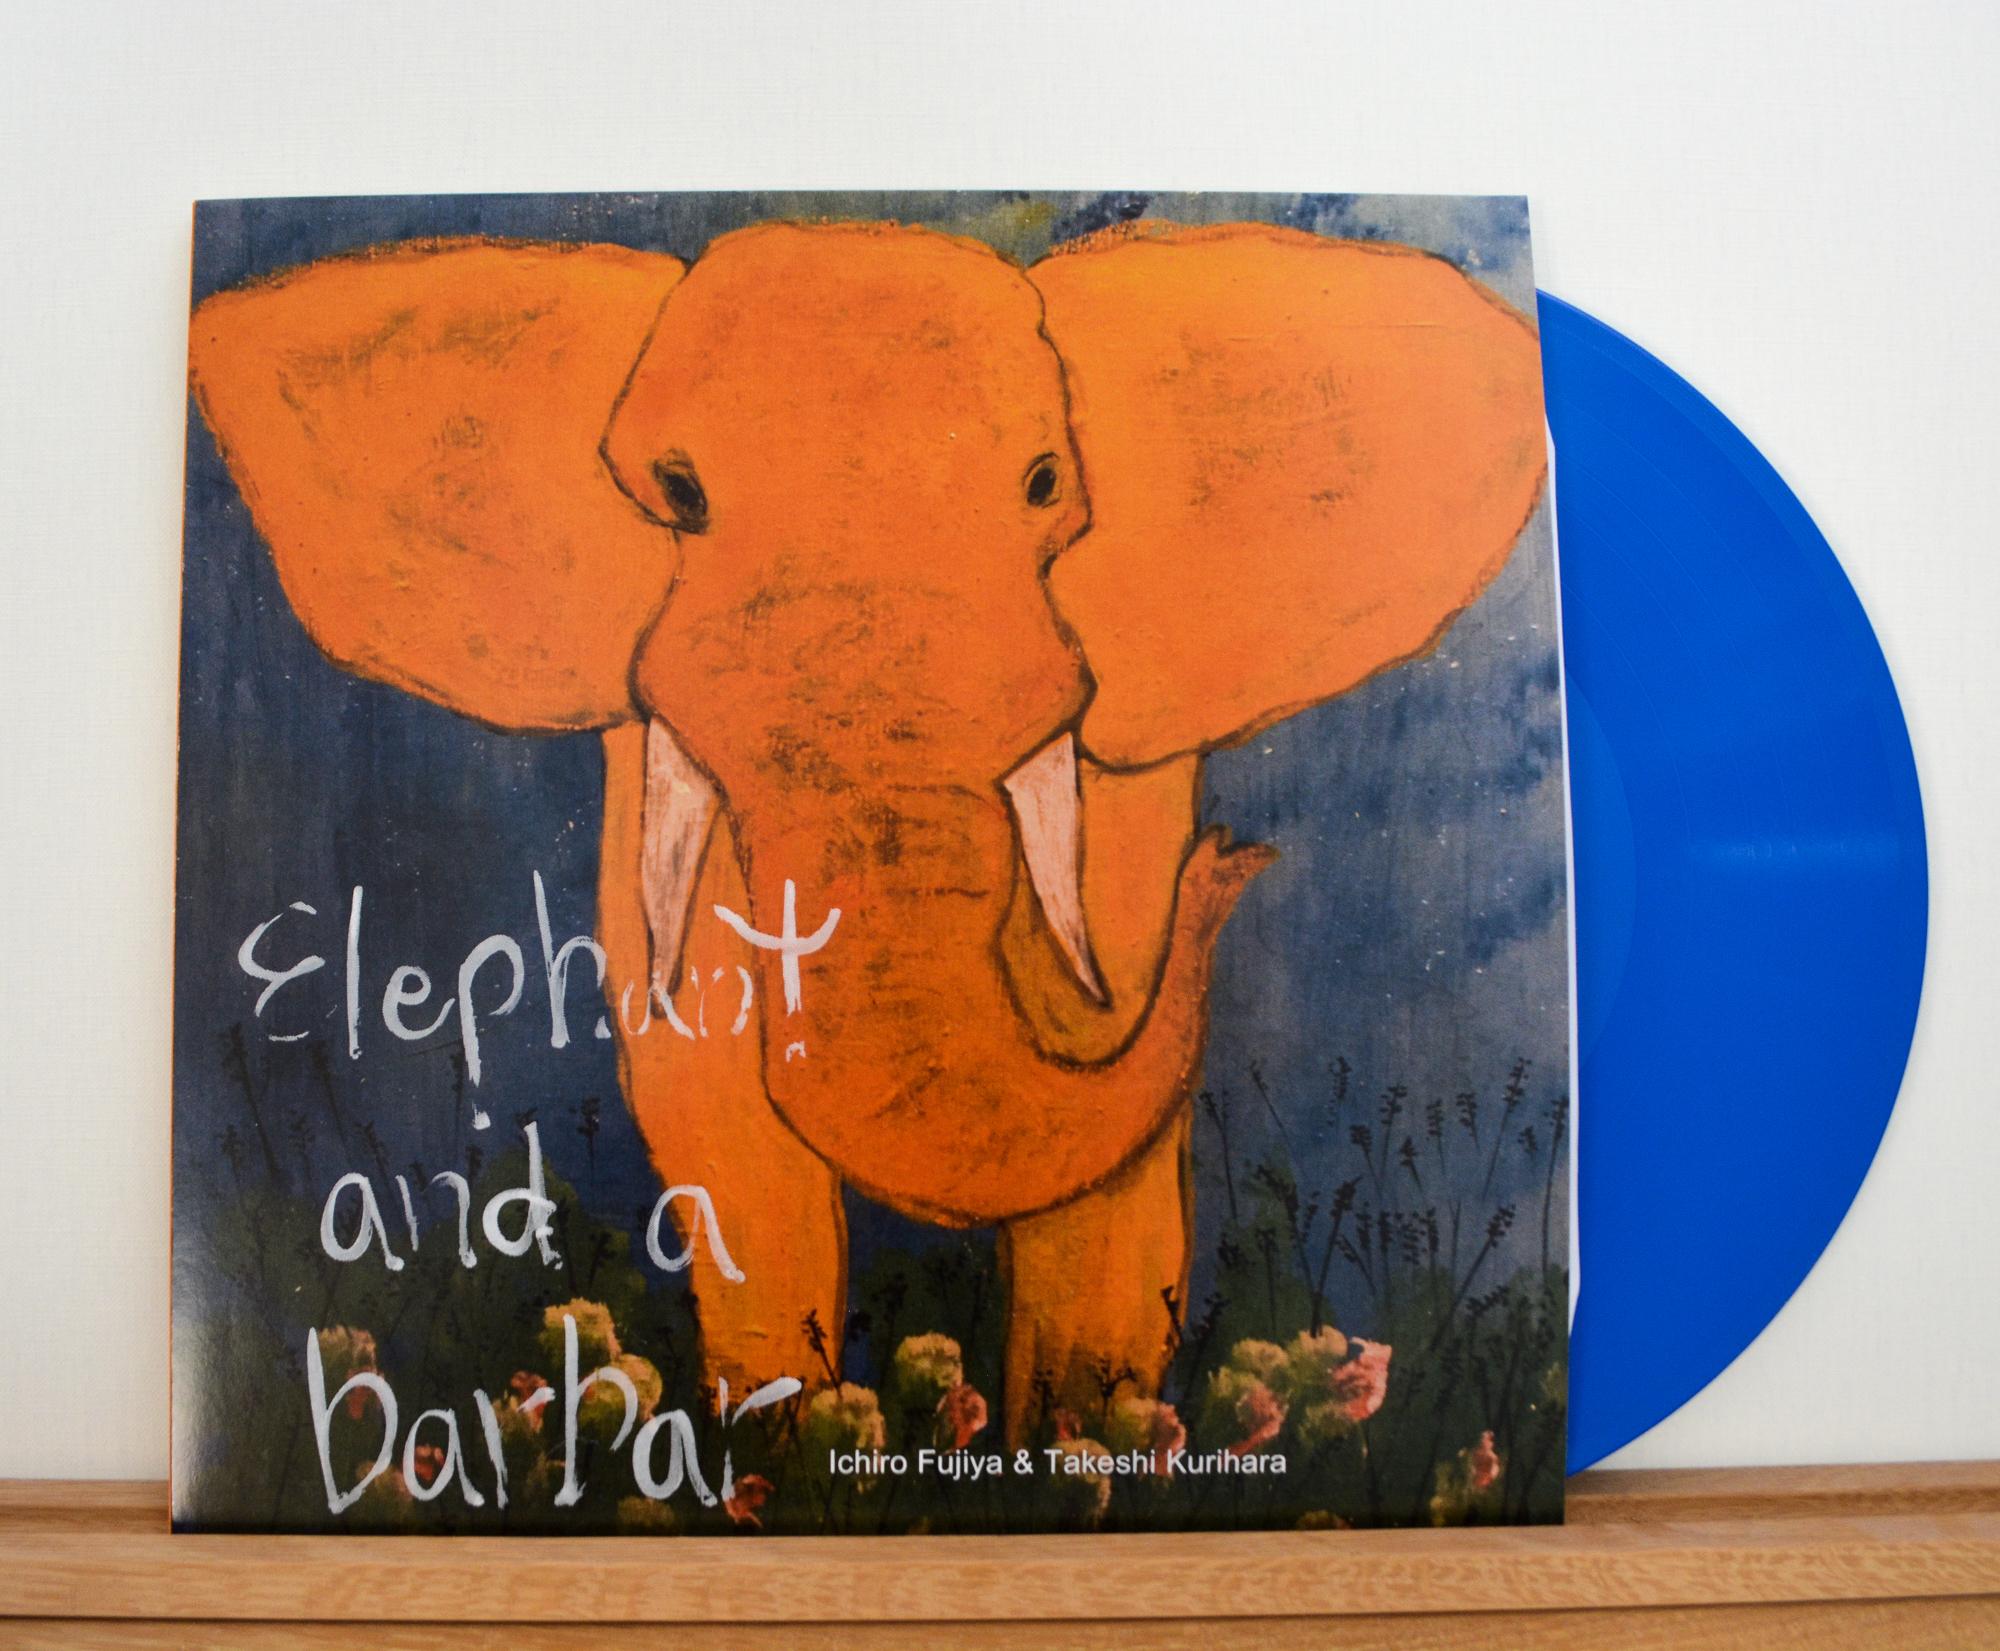 『Elephant and a barbar / Ichiro Fujiya & Takeshi Kurihara』2nd Press Blue Vinyl